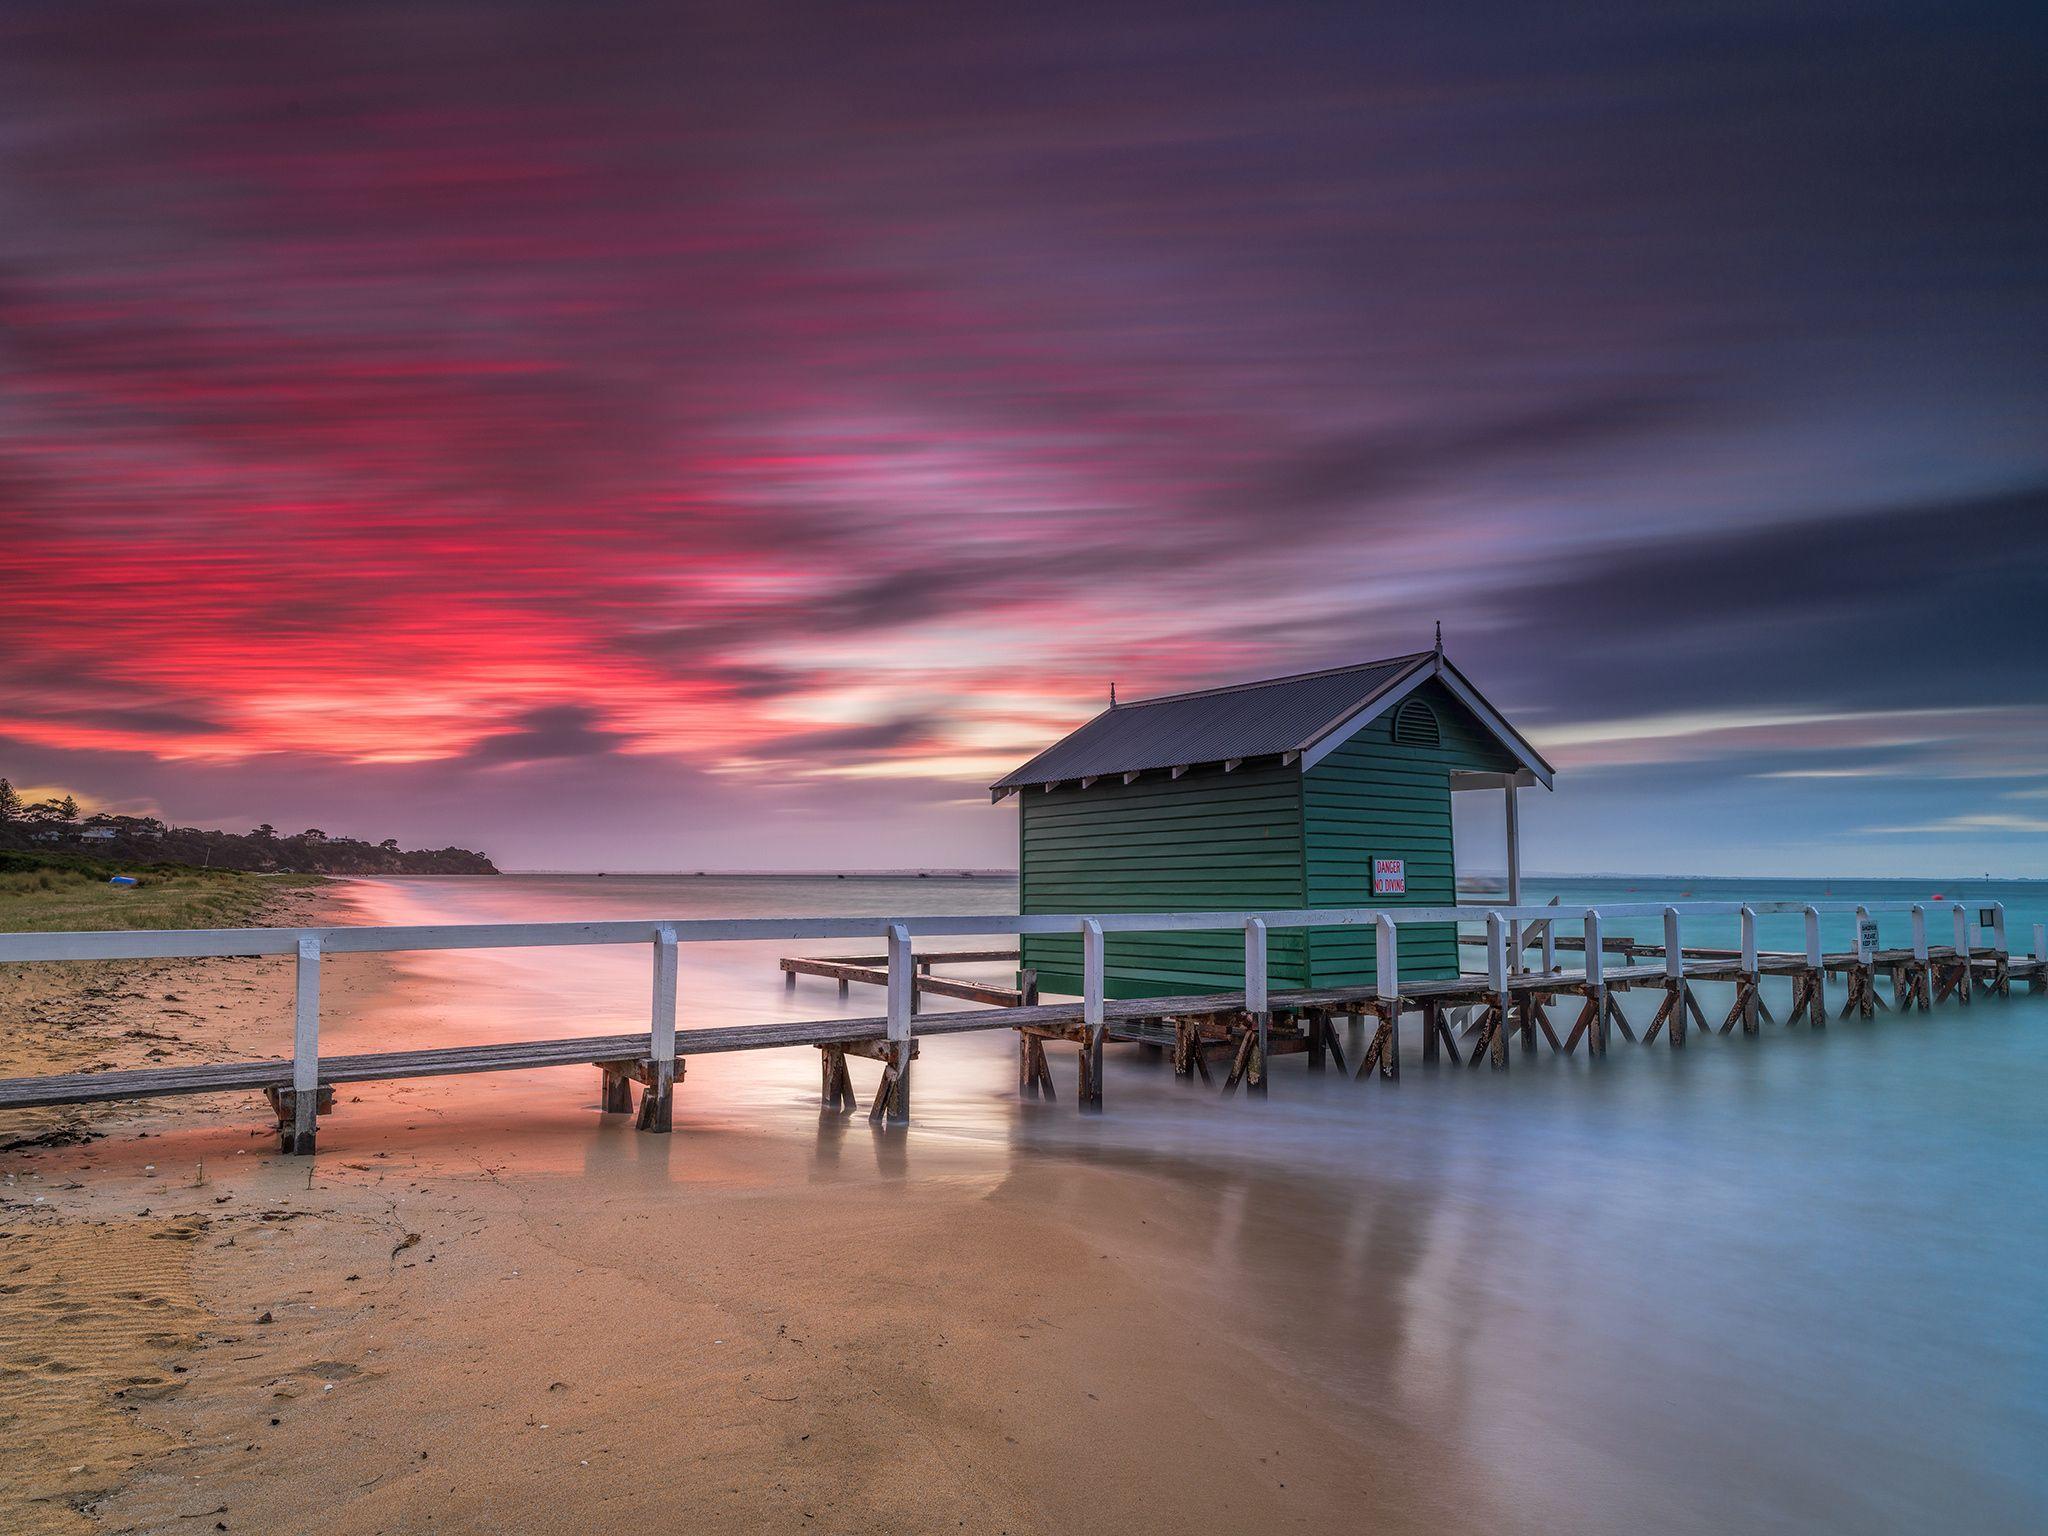 Shelley Beach Sunset by bjornbaklien1 on 500px